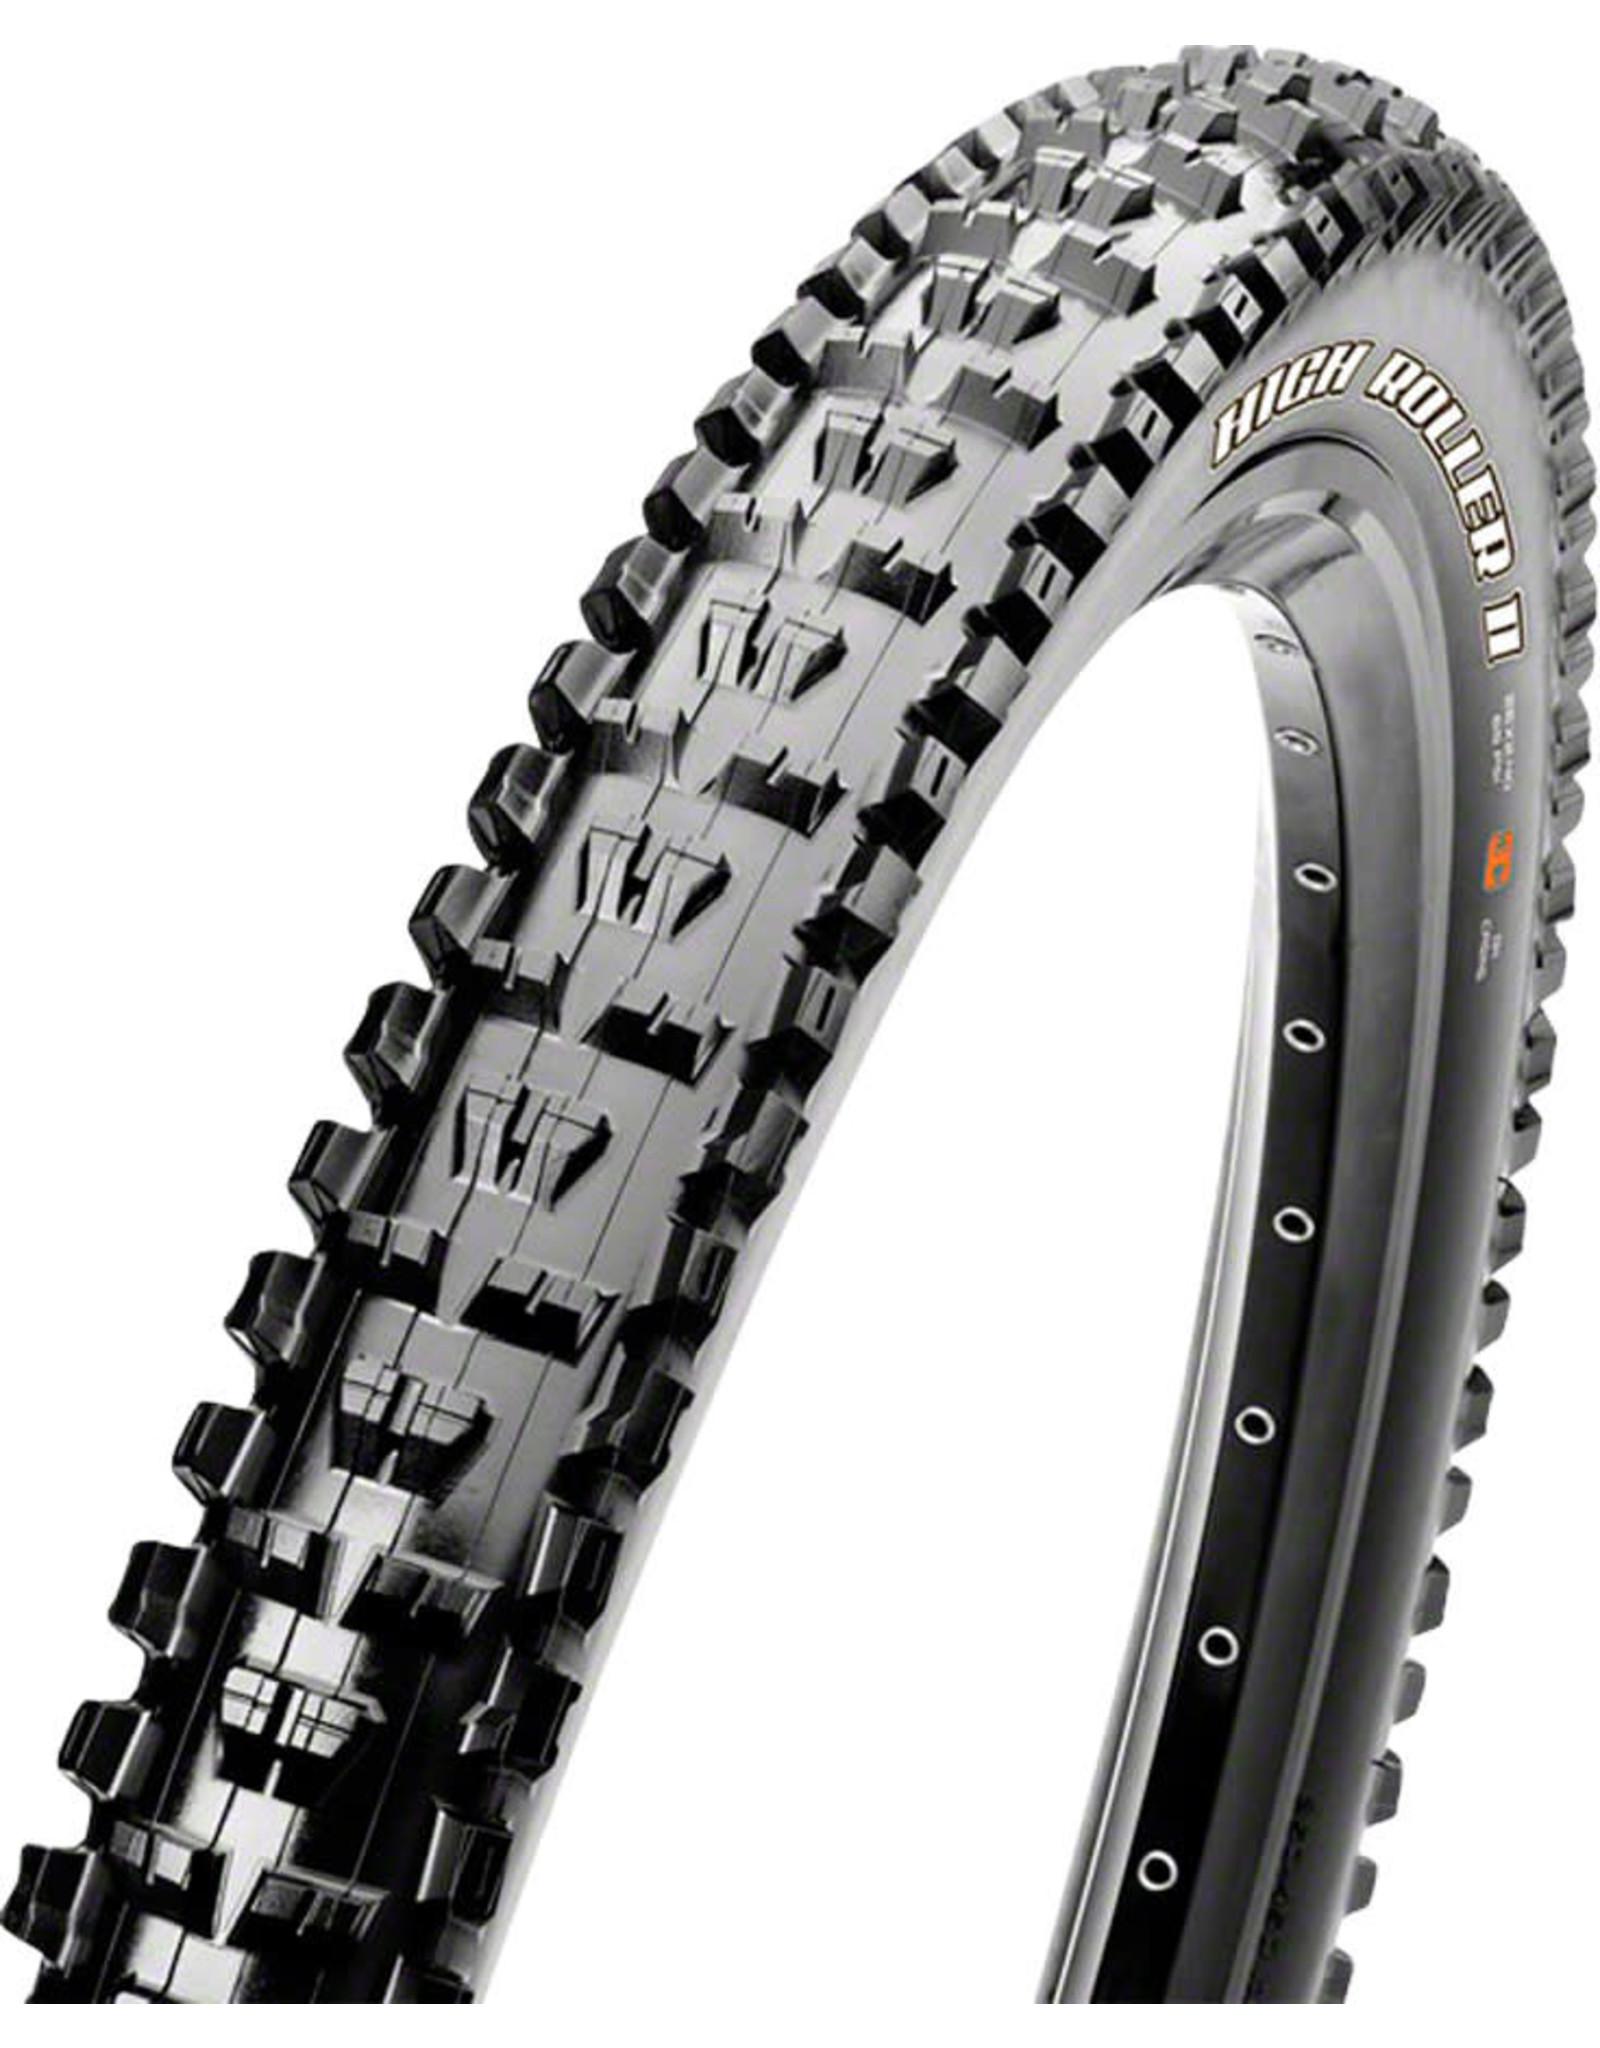 Maxxis Maxxis High Roller II Tire - 26 x 2.3, Tubeless, Folding, Black, Dual, EXO